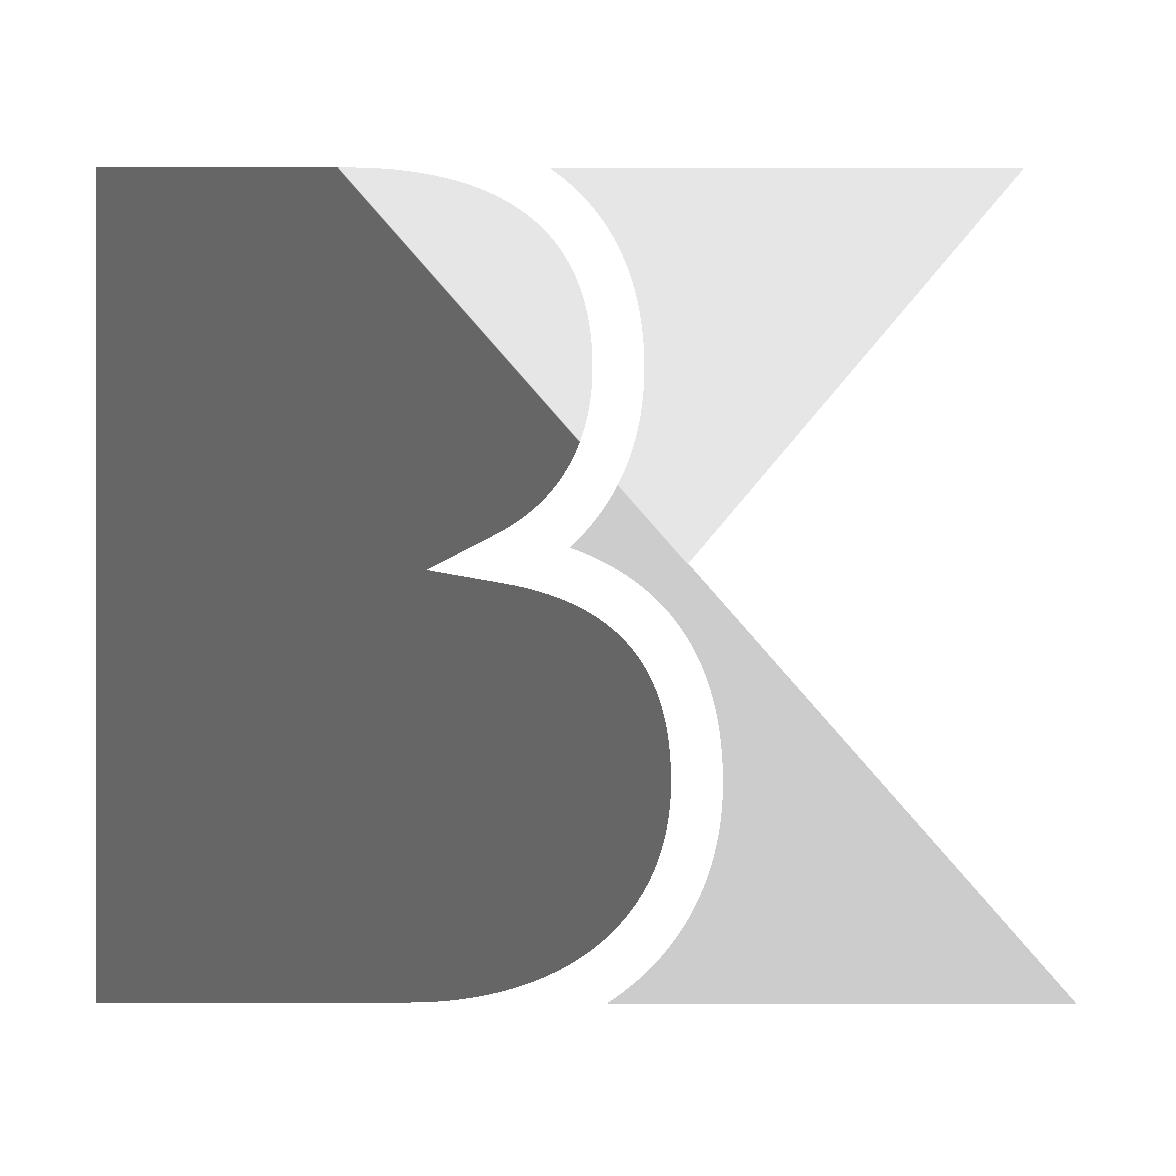 Burak Kilic | Multidisciplinary Graphic Designer